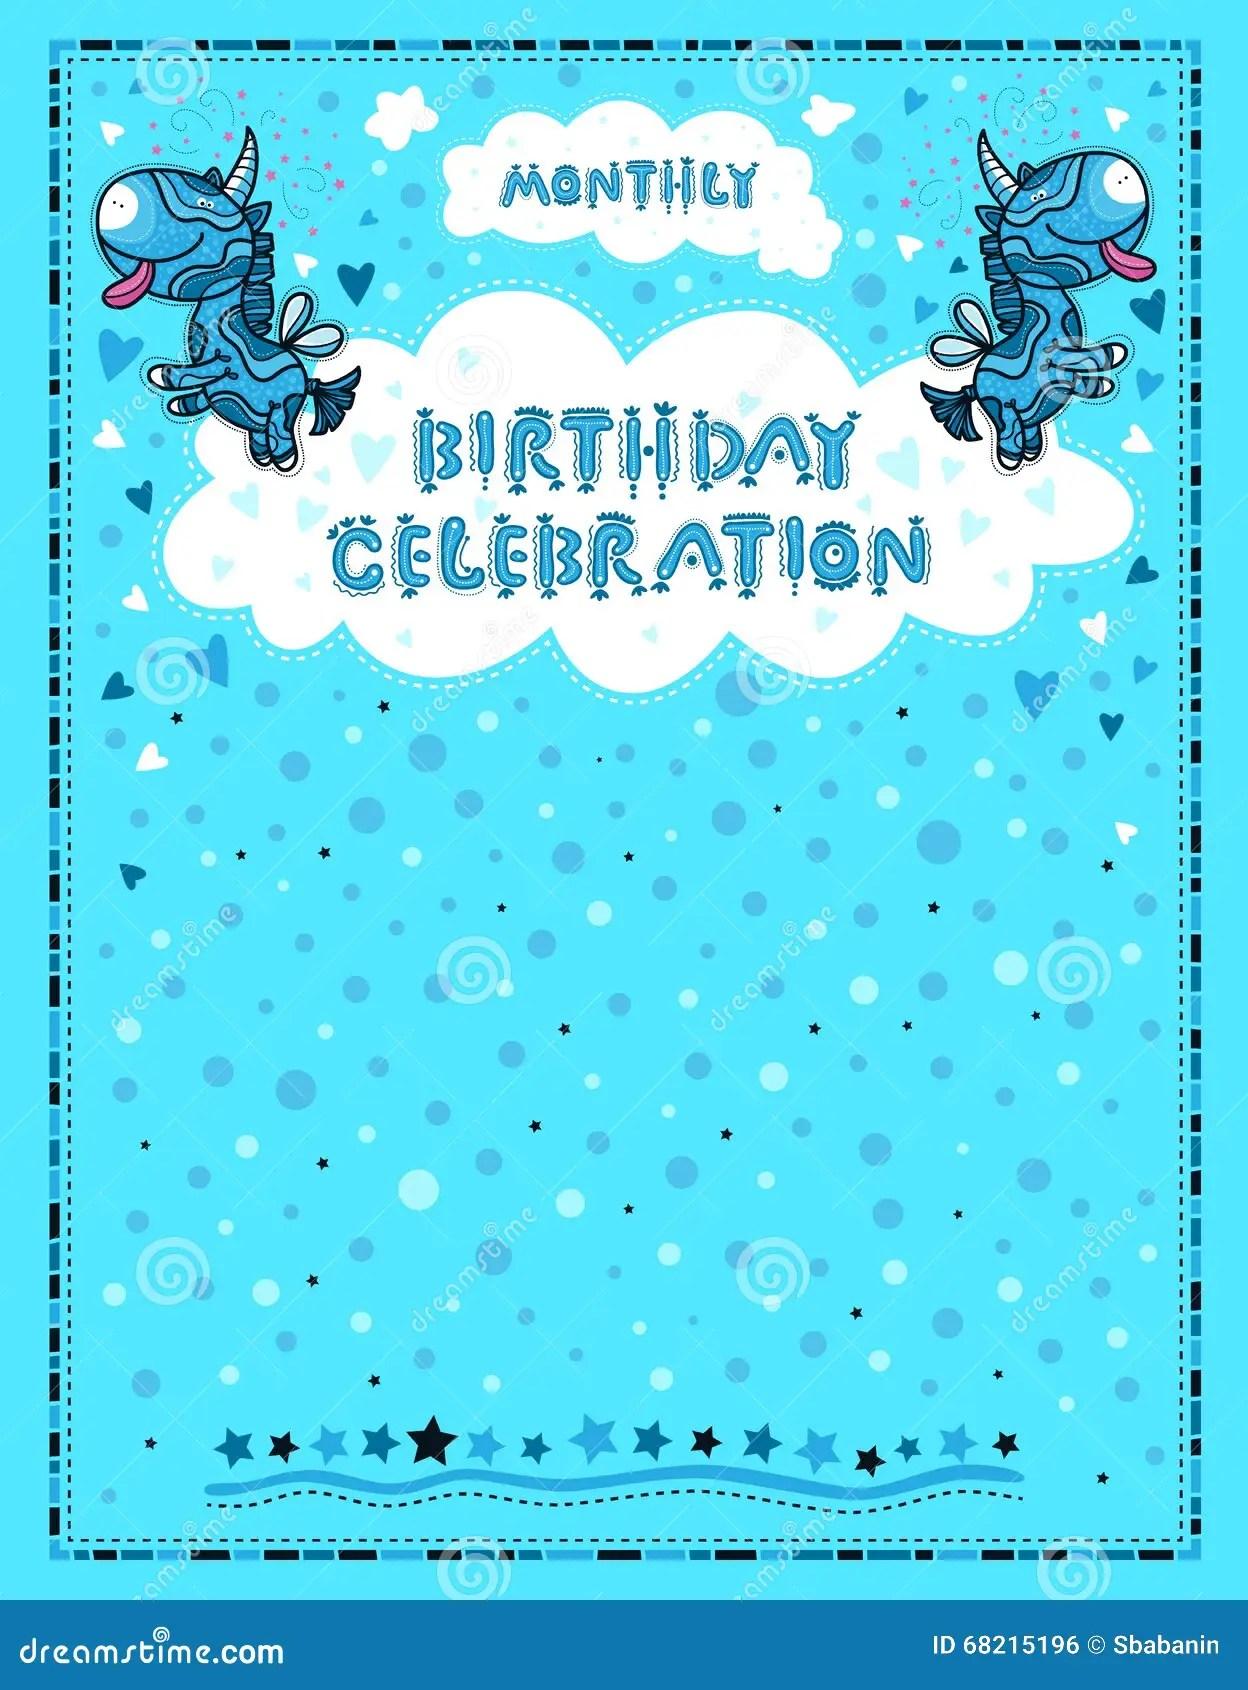 Celebration Letter Invitation Letter For Company Anniversary - celebration letter